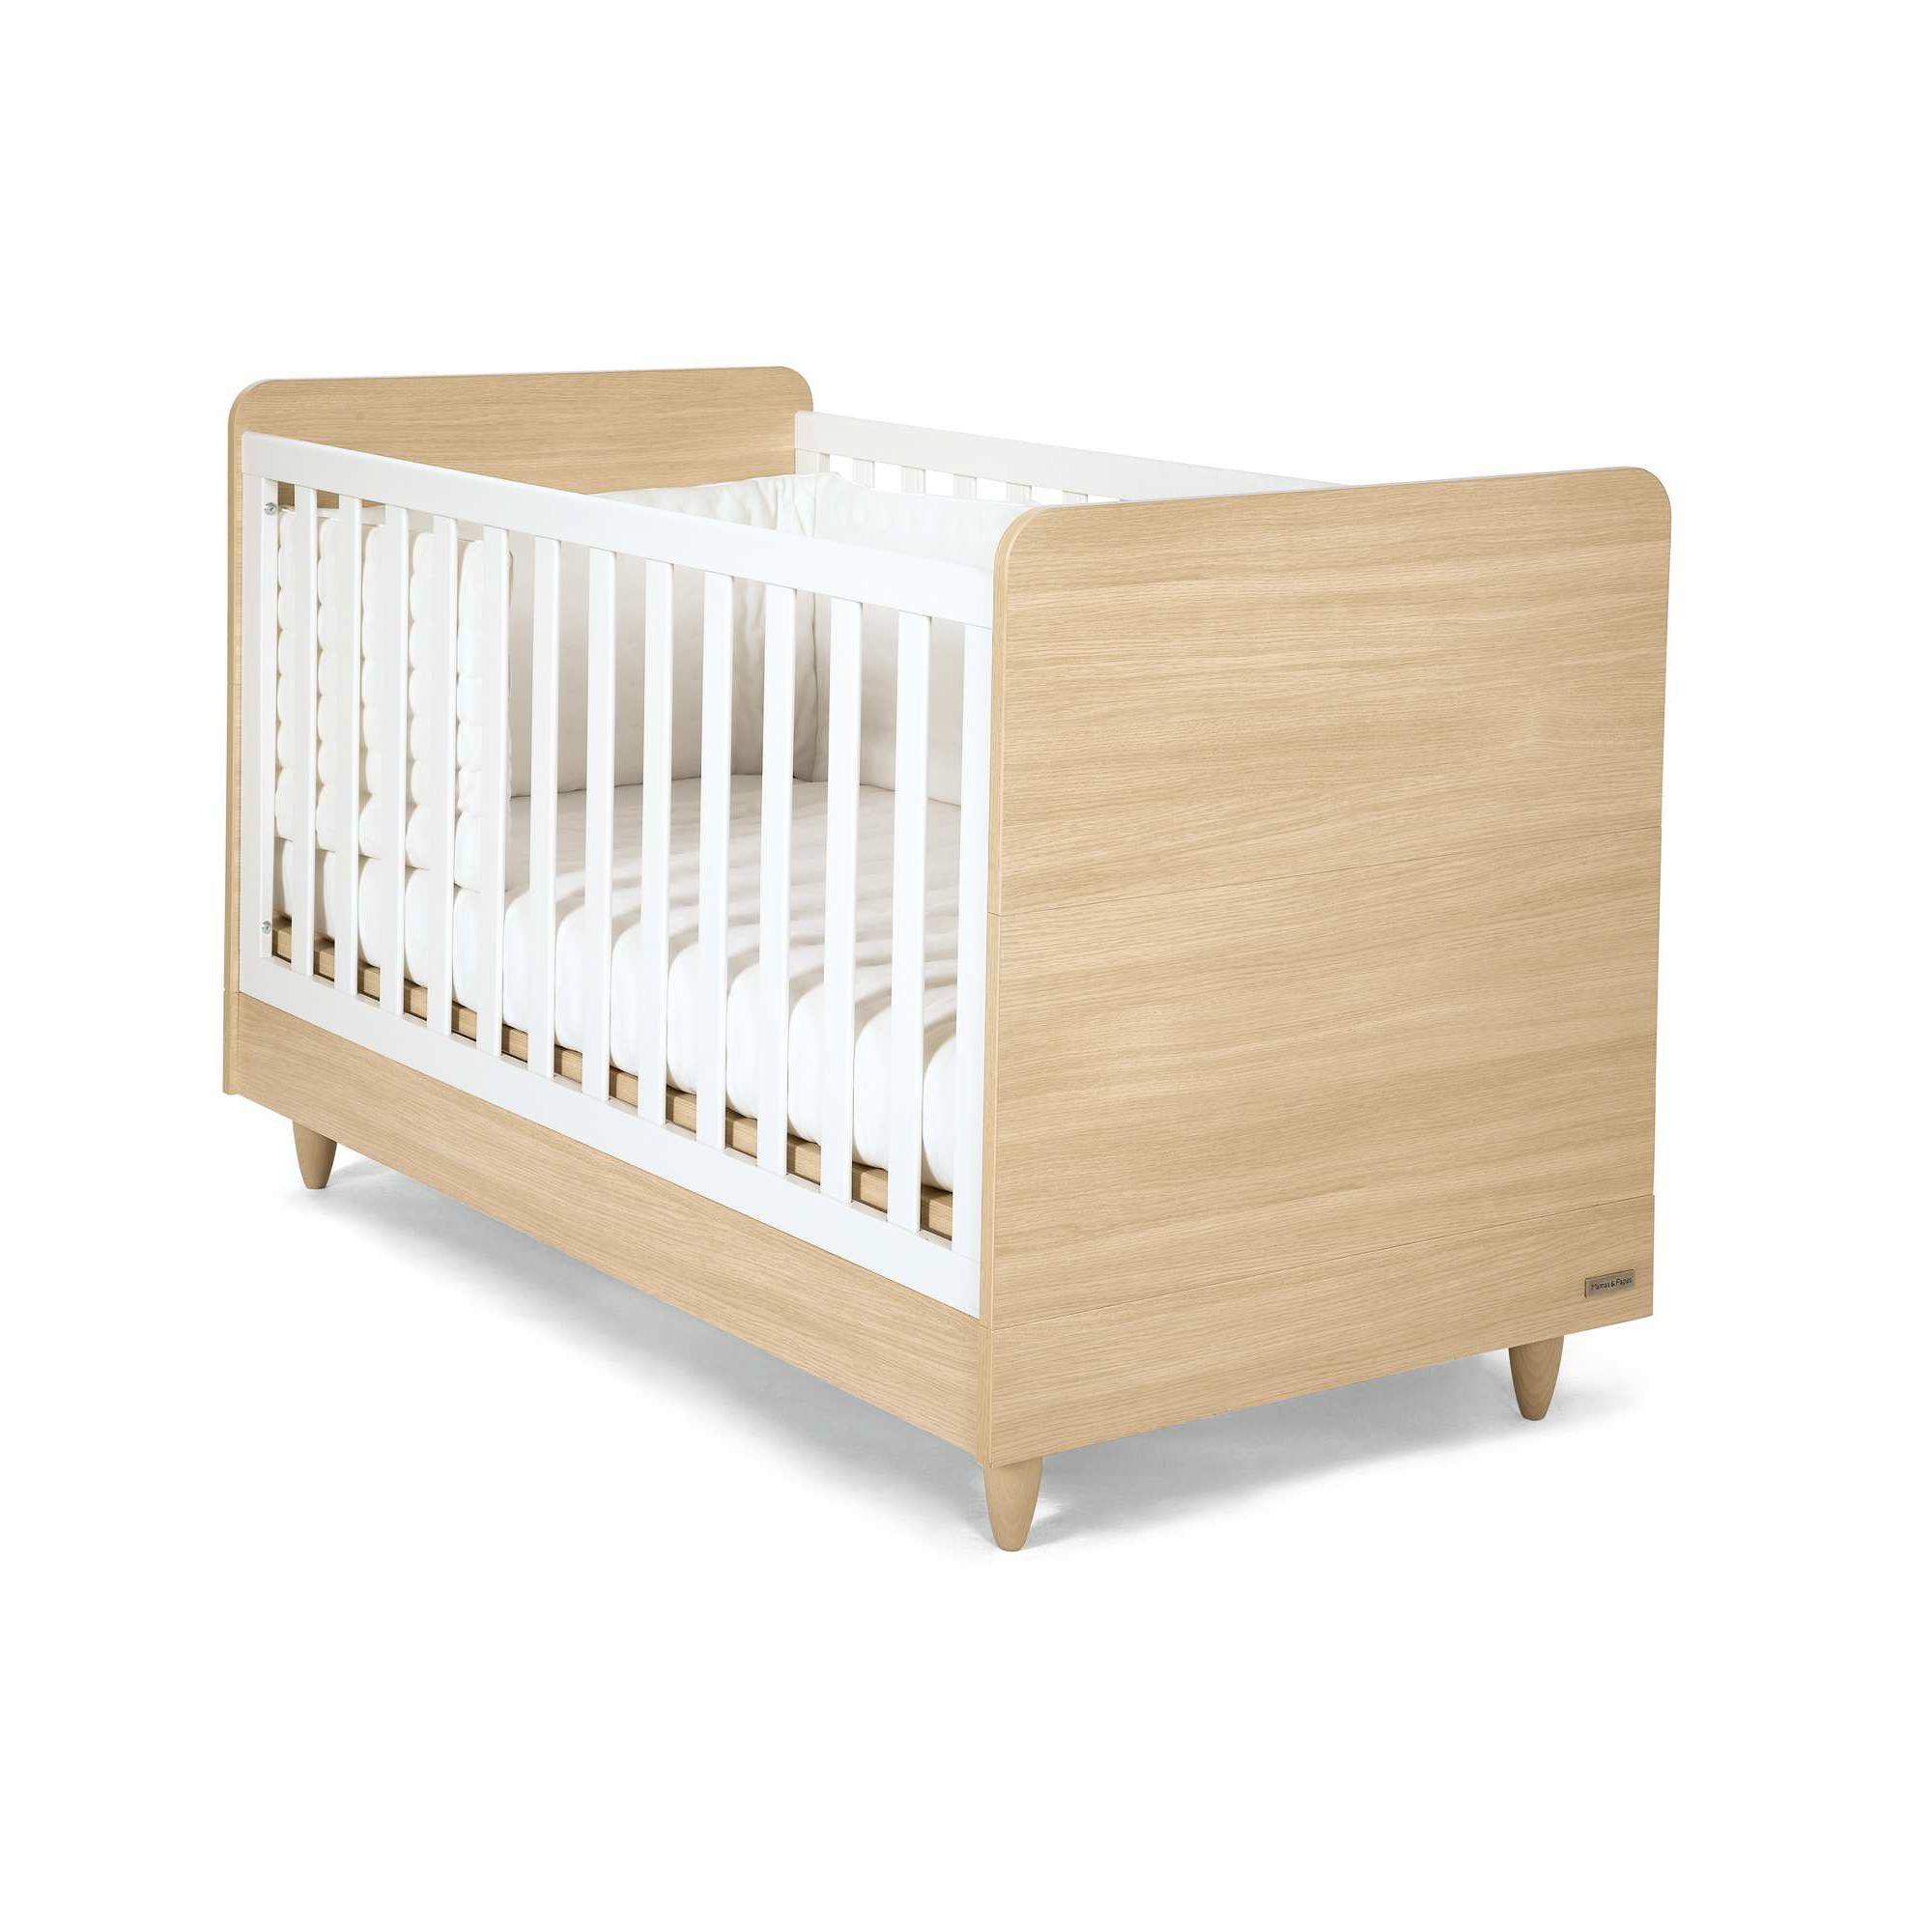 Mamas & Papas - Manhattan Cot/Toddler Bed - Natural/White at Tesco Direct